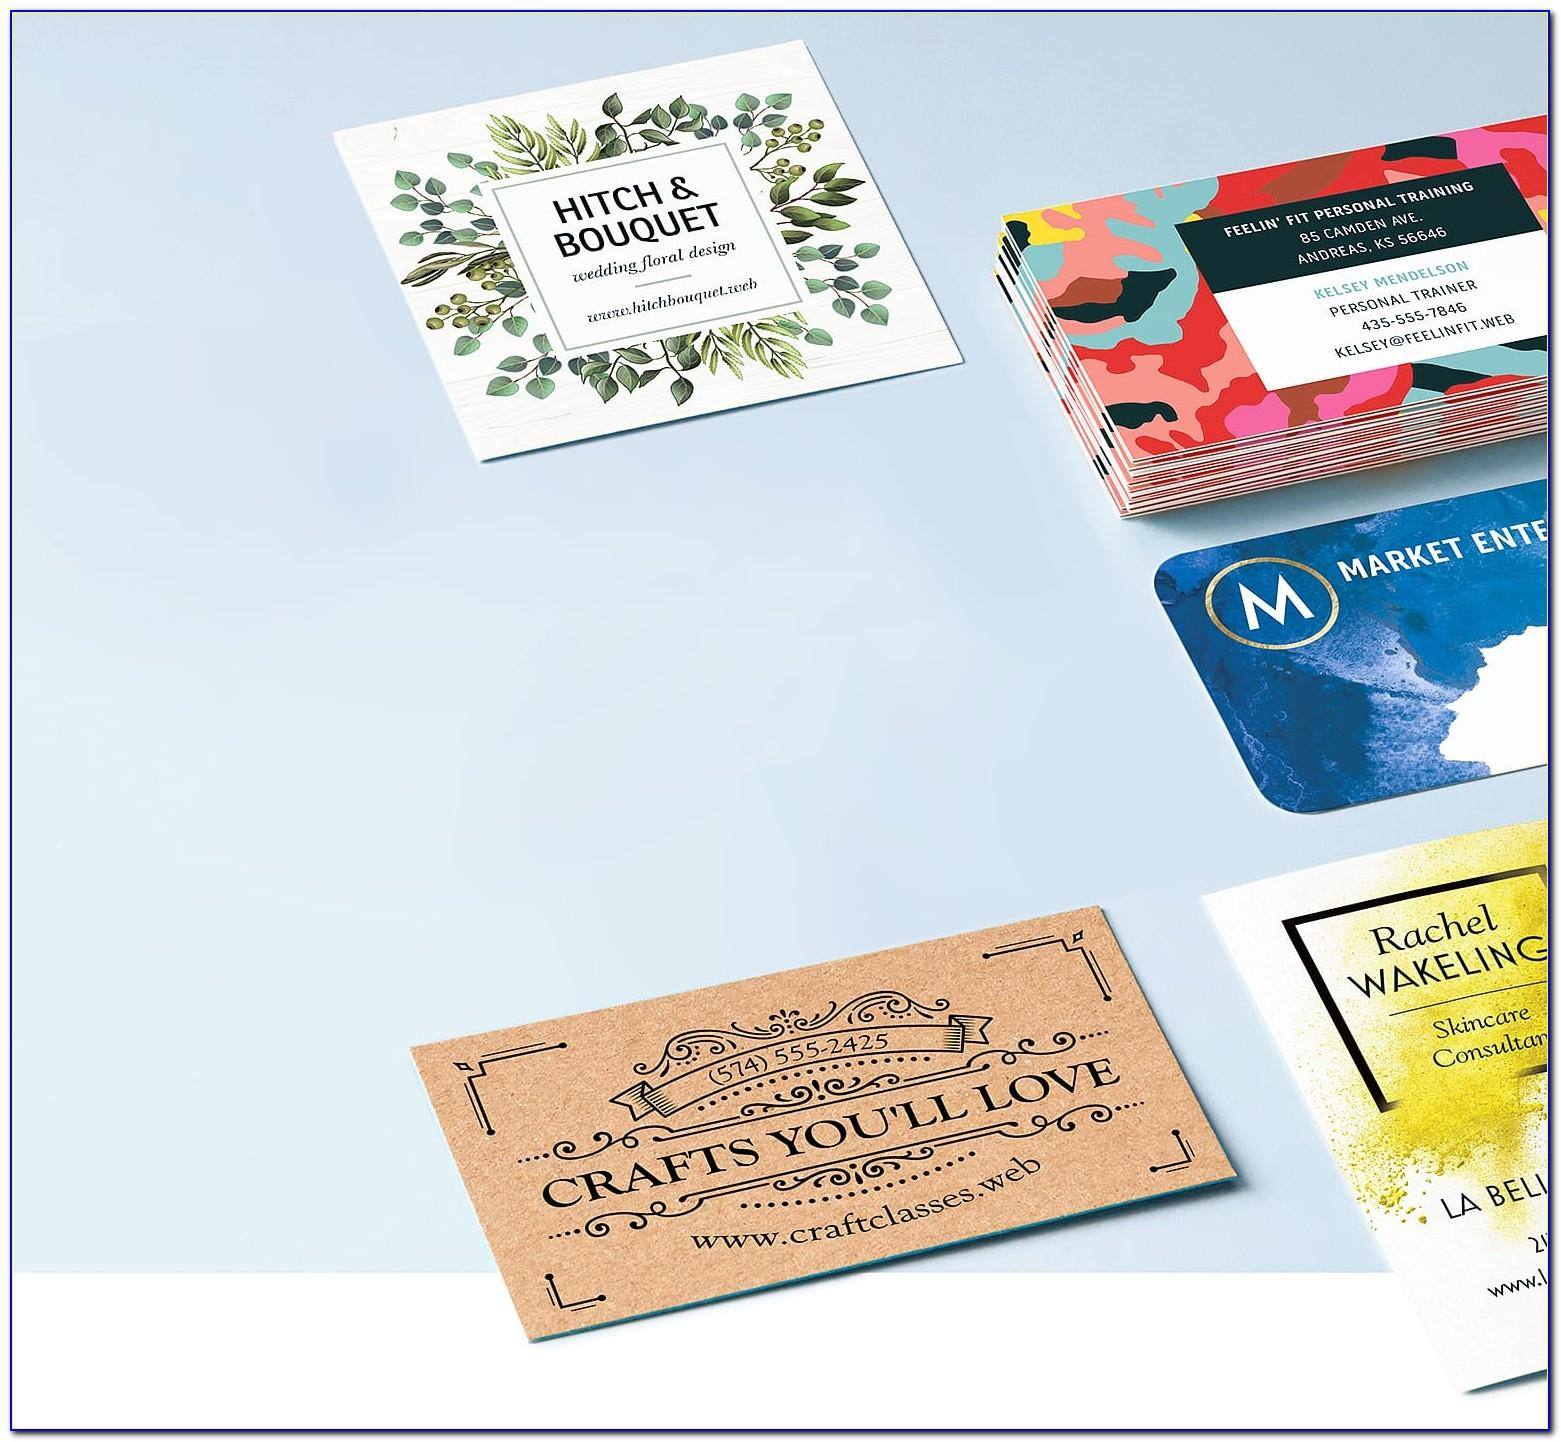 Vistaprint 500 Business Cards For $10